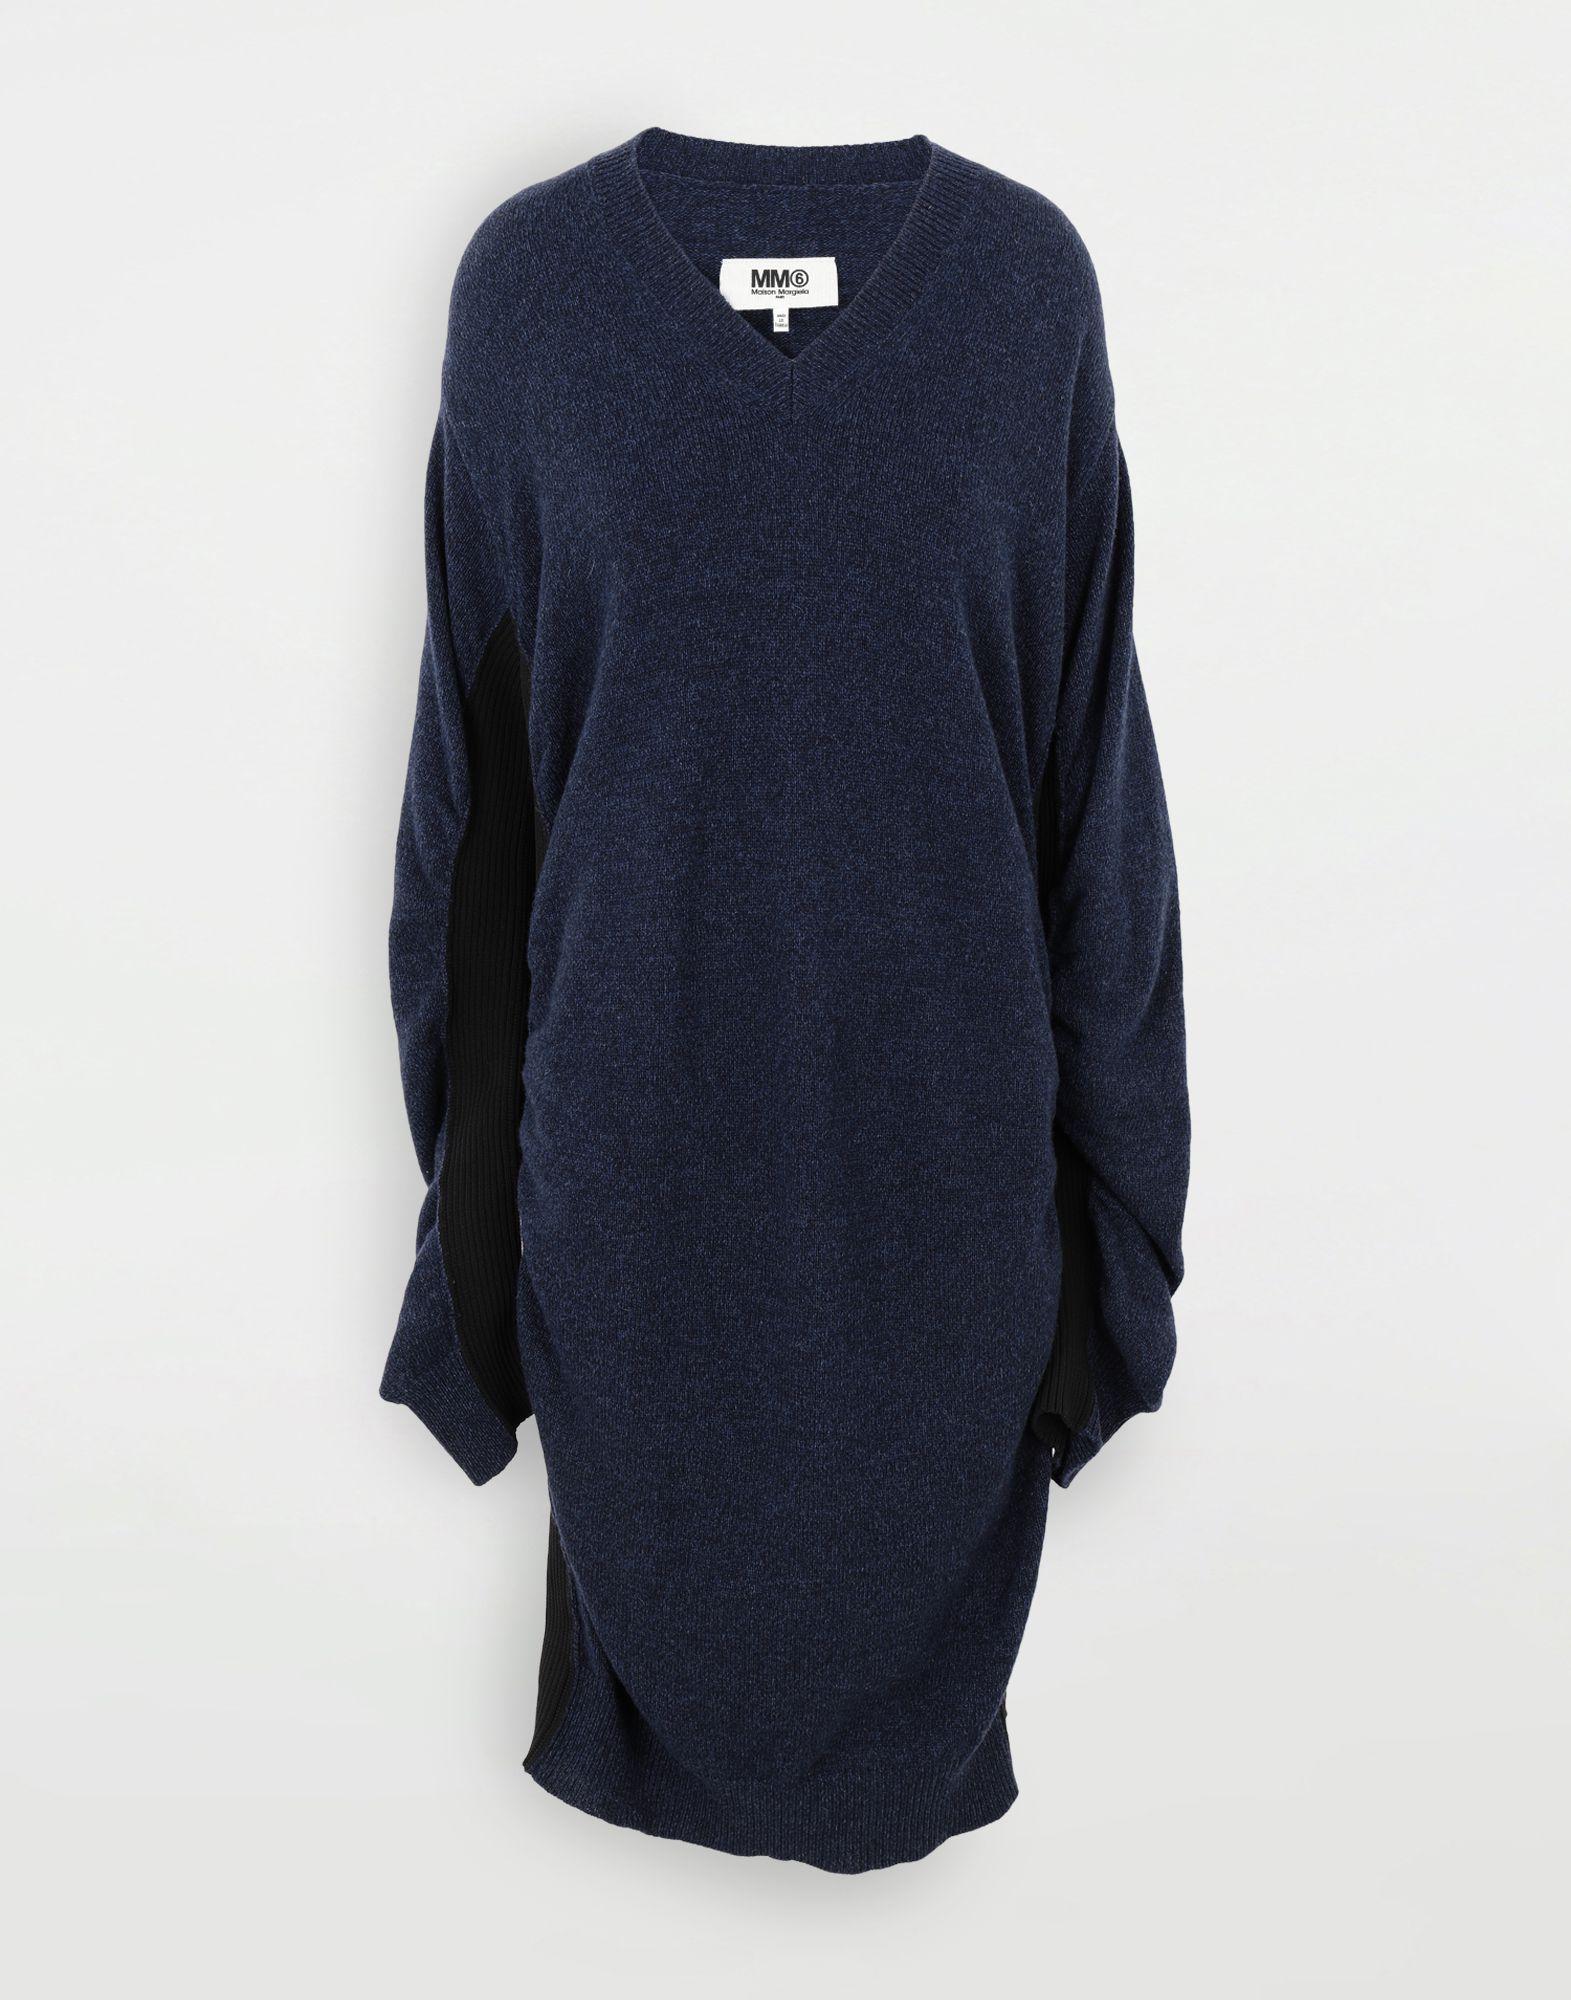 MM6 MAISON MARGIELA Ruched wool dress Dress Woman f